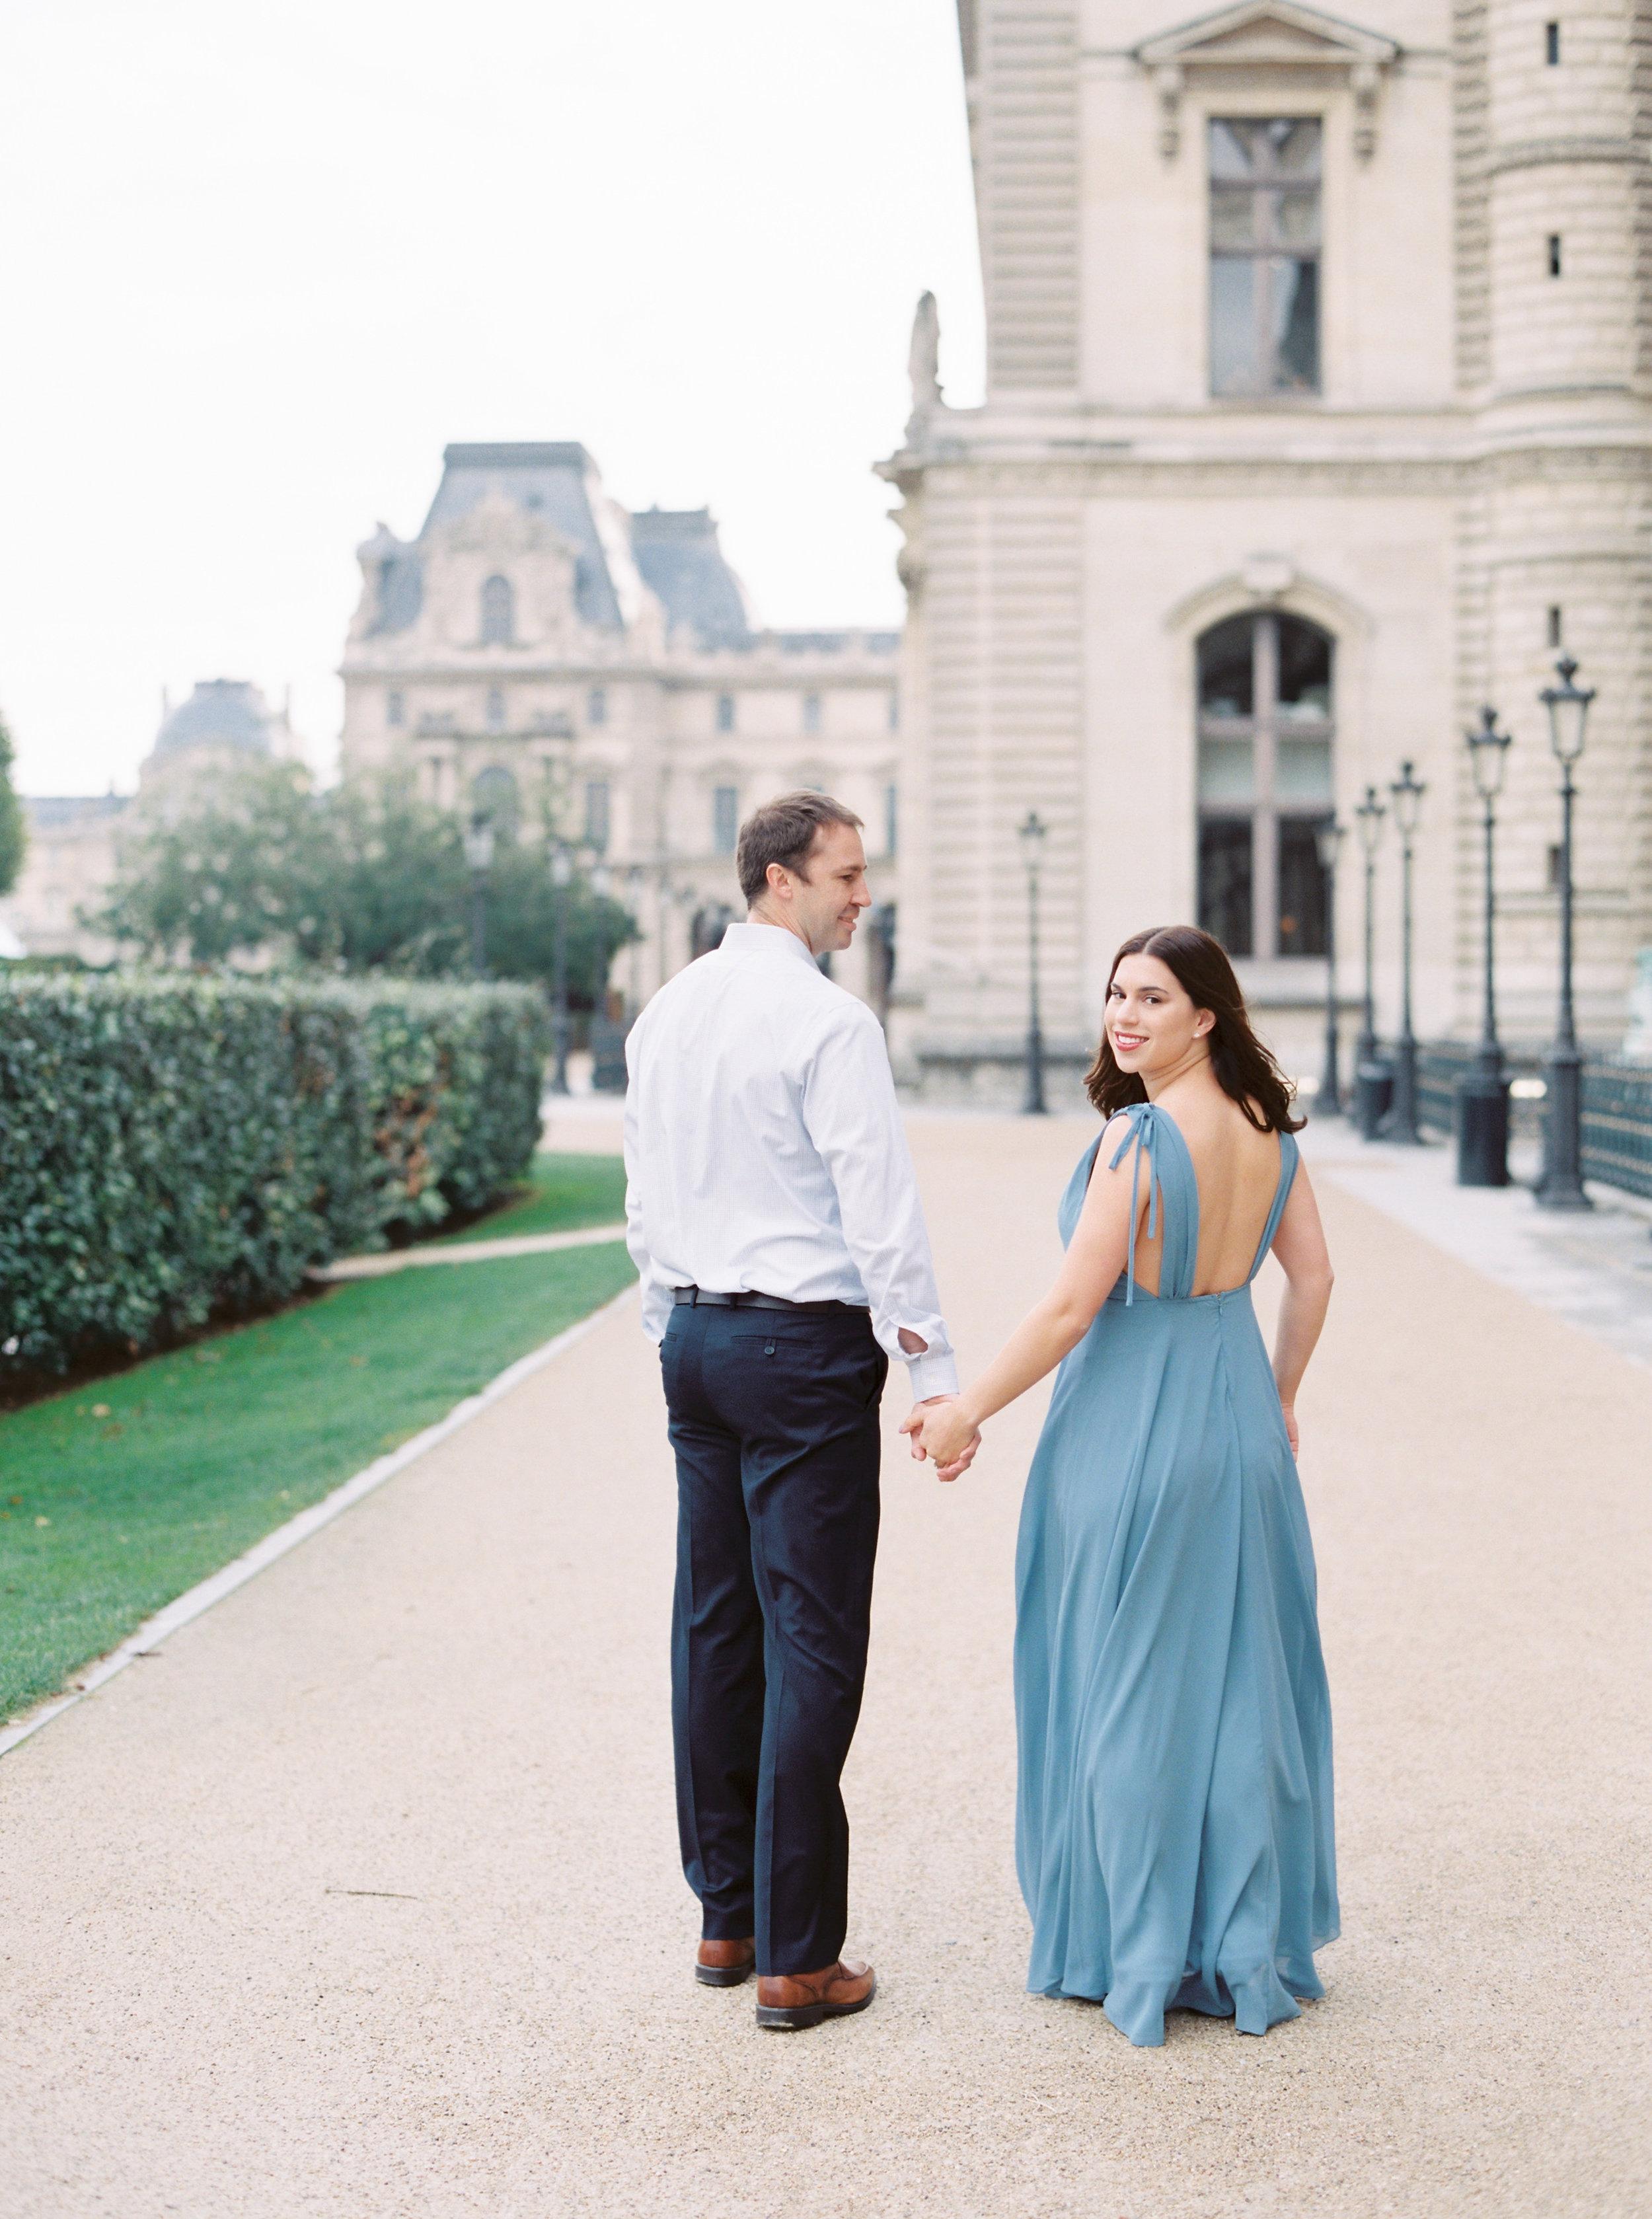 paris-france-wedding-photographer-destination-photographer-91.jpg